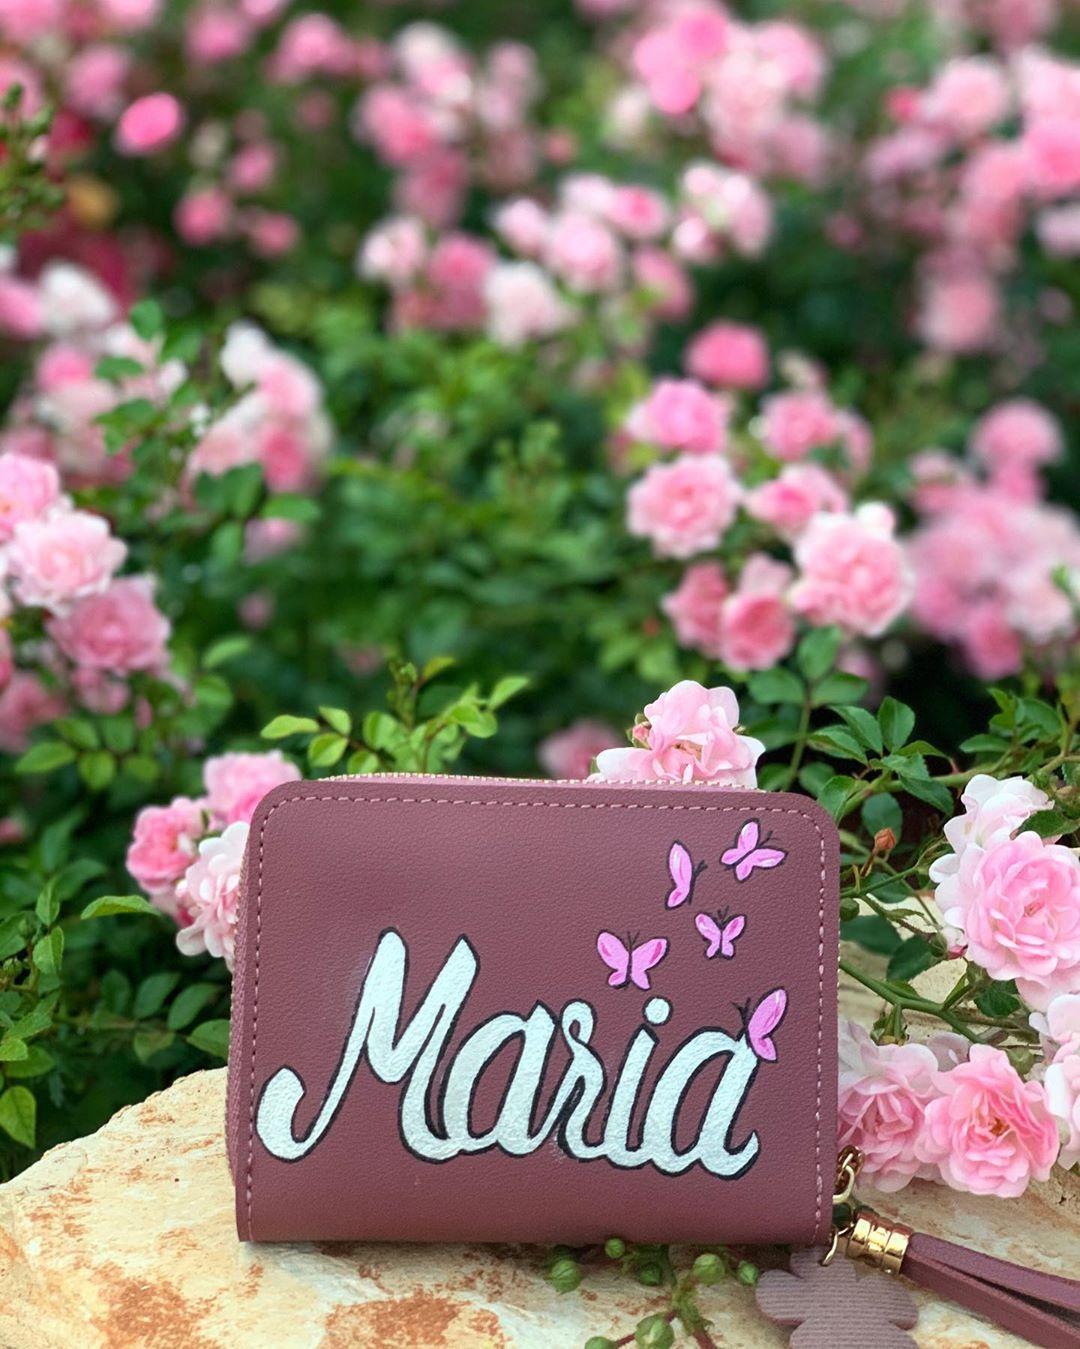 هدية لطيفة لبنوت لطيفة ماريا اسماء فراشة ورود تخطيط فن رسم رسوم الوان مشغل وداد حديقة Painted Clothes Hand Painted Cards